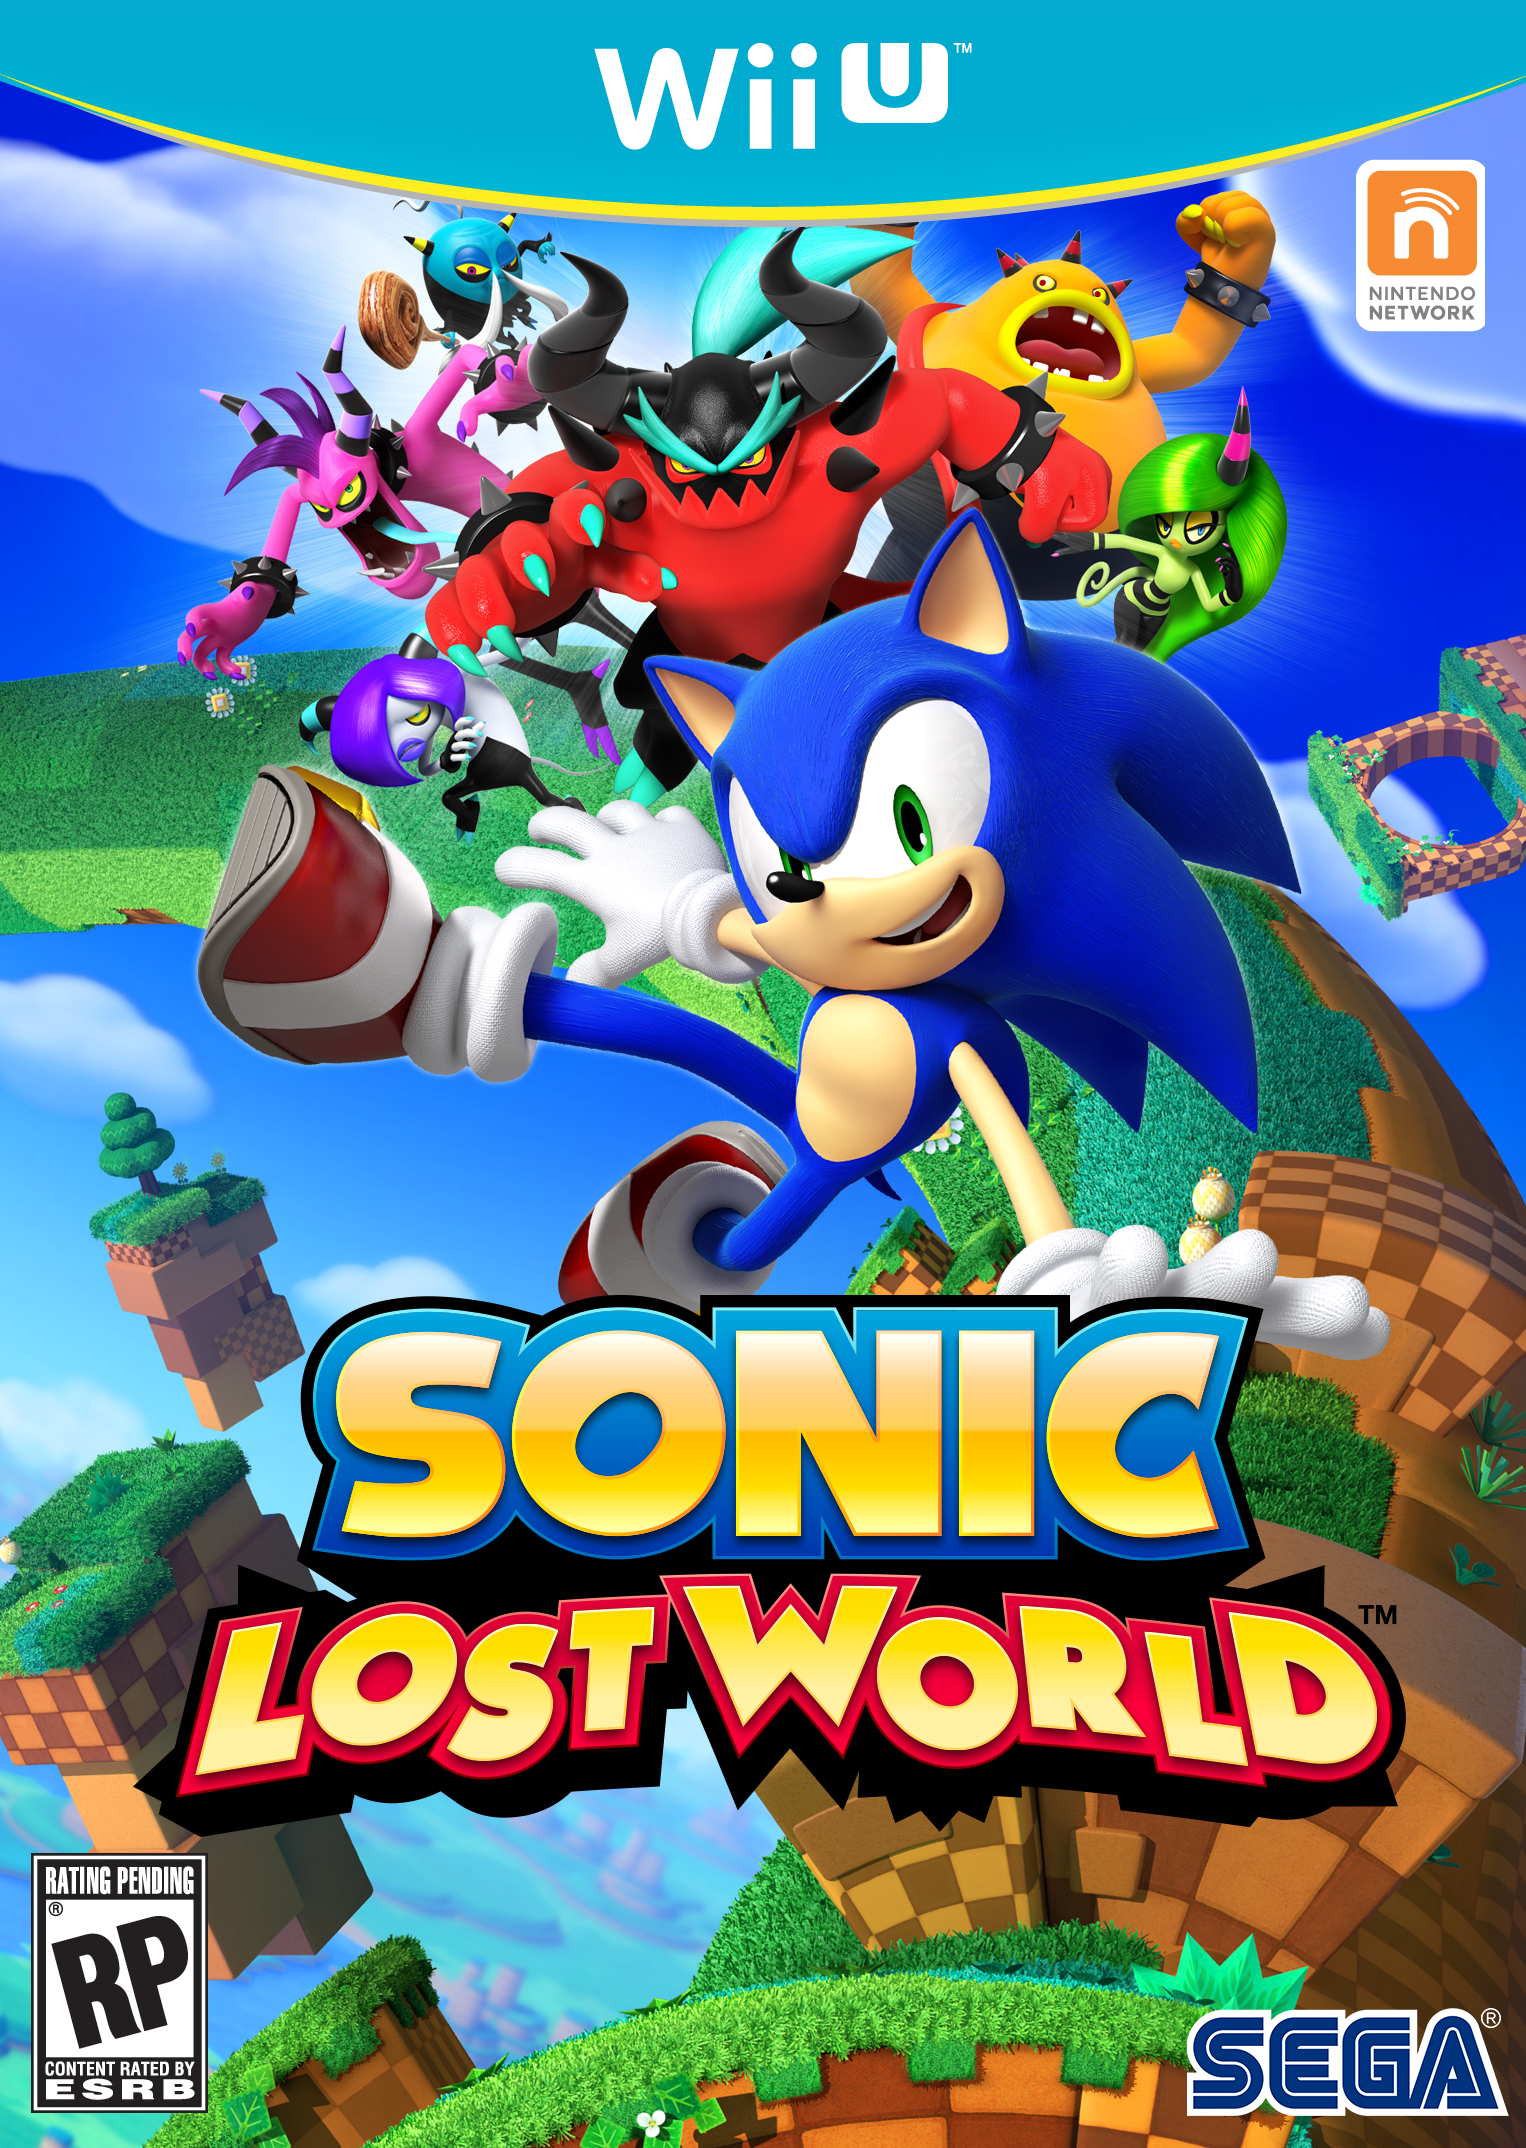 Nintendo Wii U Games : All nintendo sega partnered sonic titles coming this